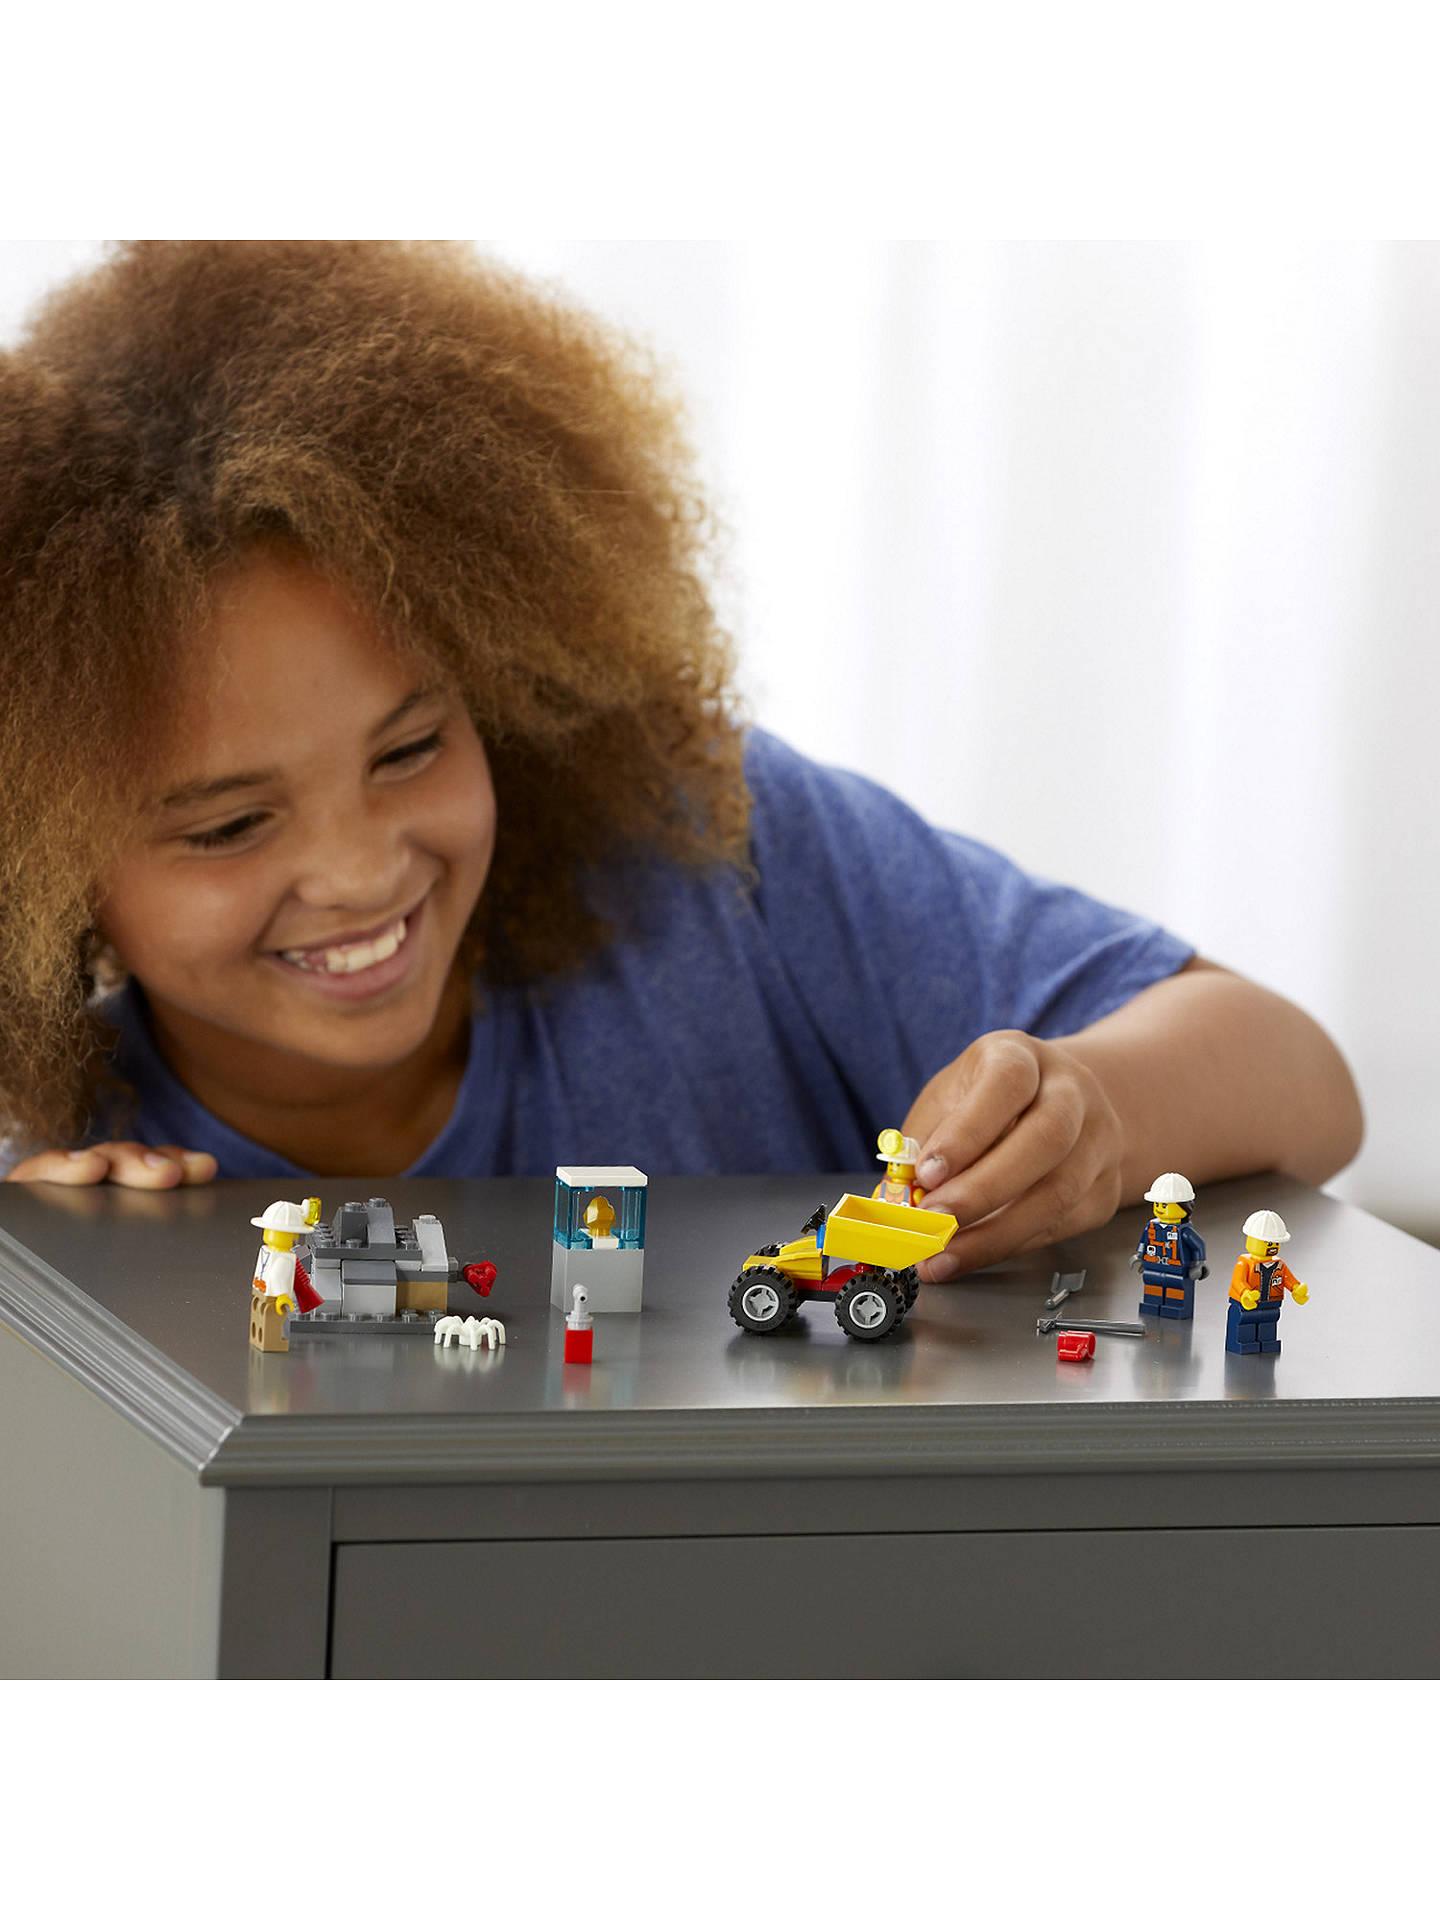 LEGO CITY NEW Female Mining Worker 60184 Minifigure Mining Team